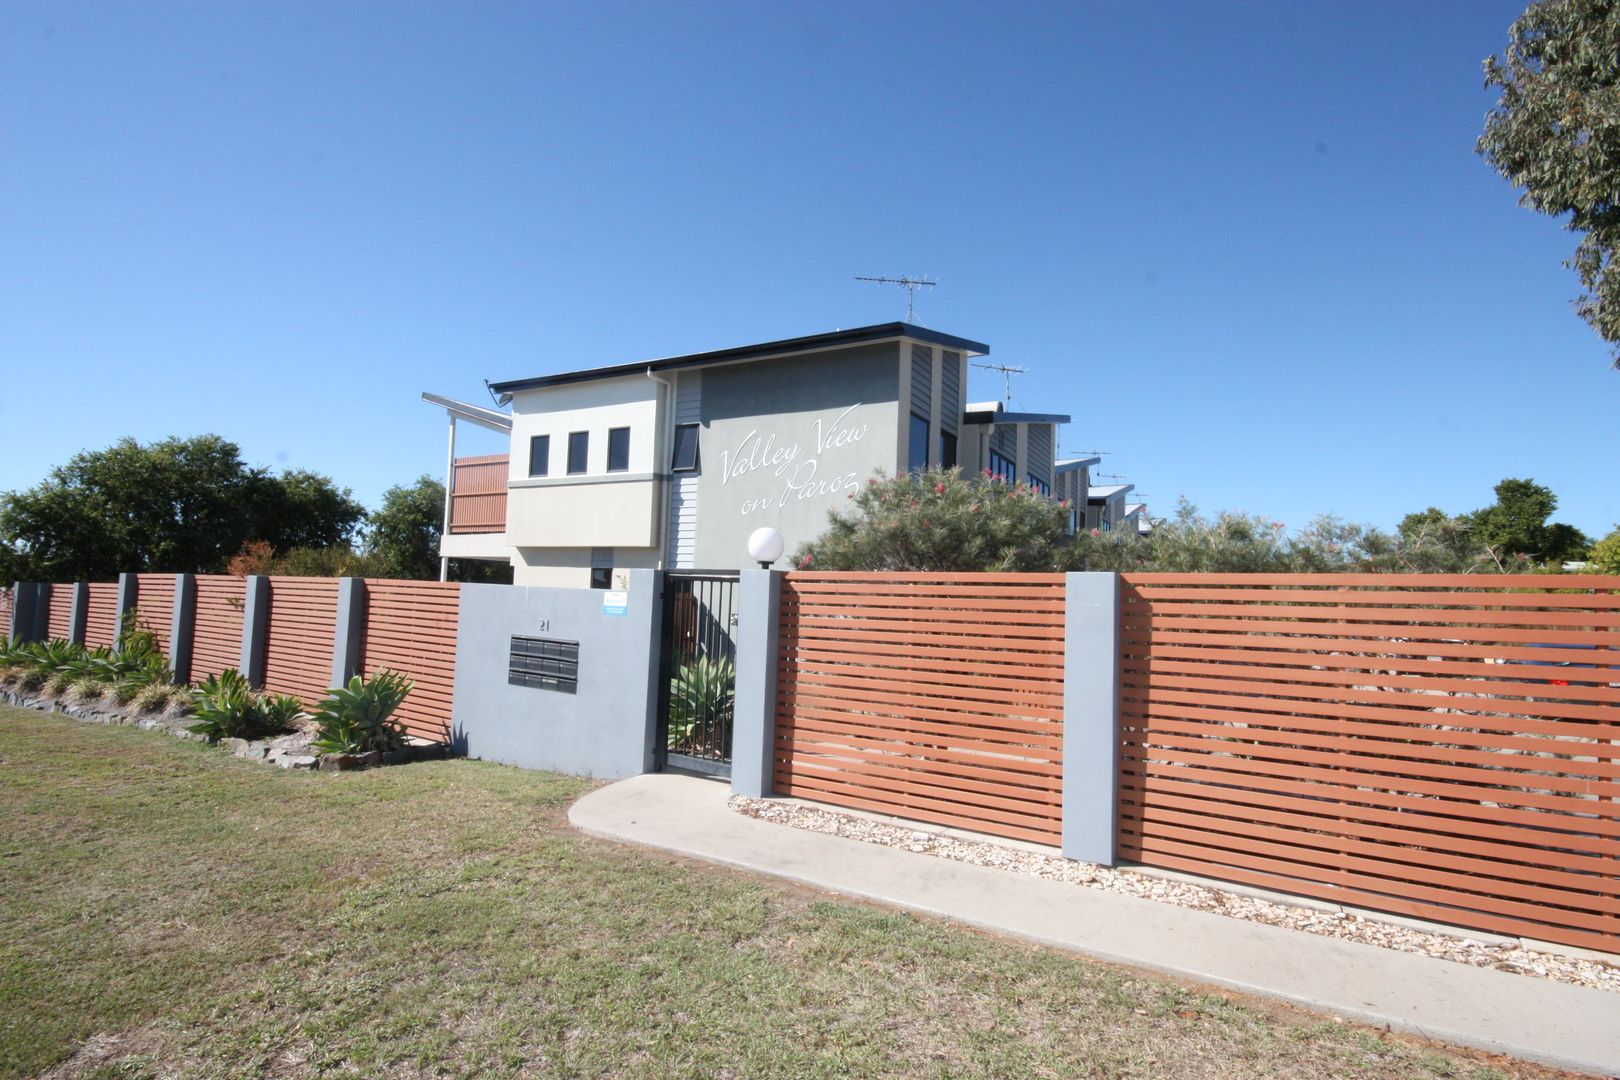 6/21 Paroz Crescent, Biloela QLD 4715, Image 0